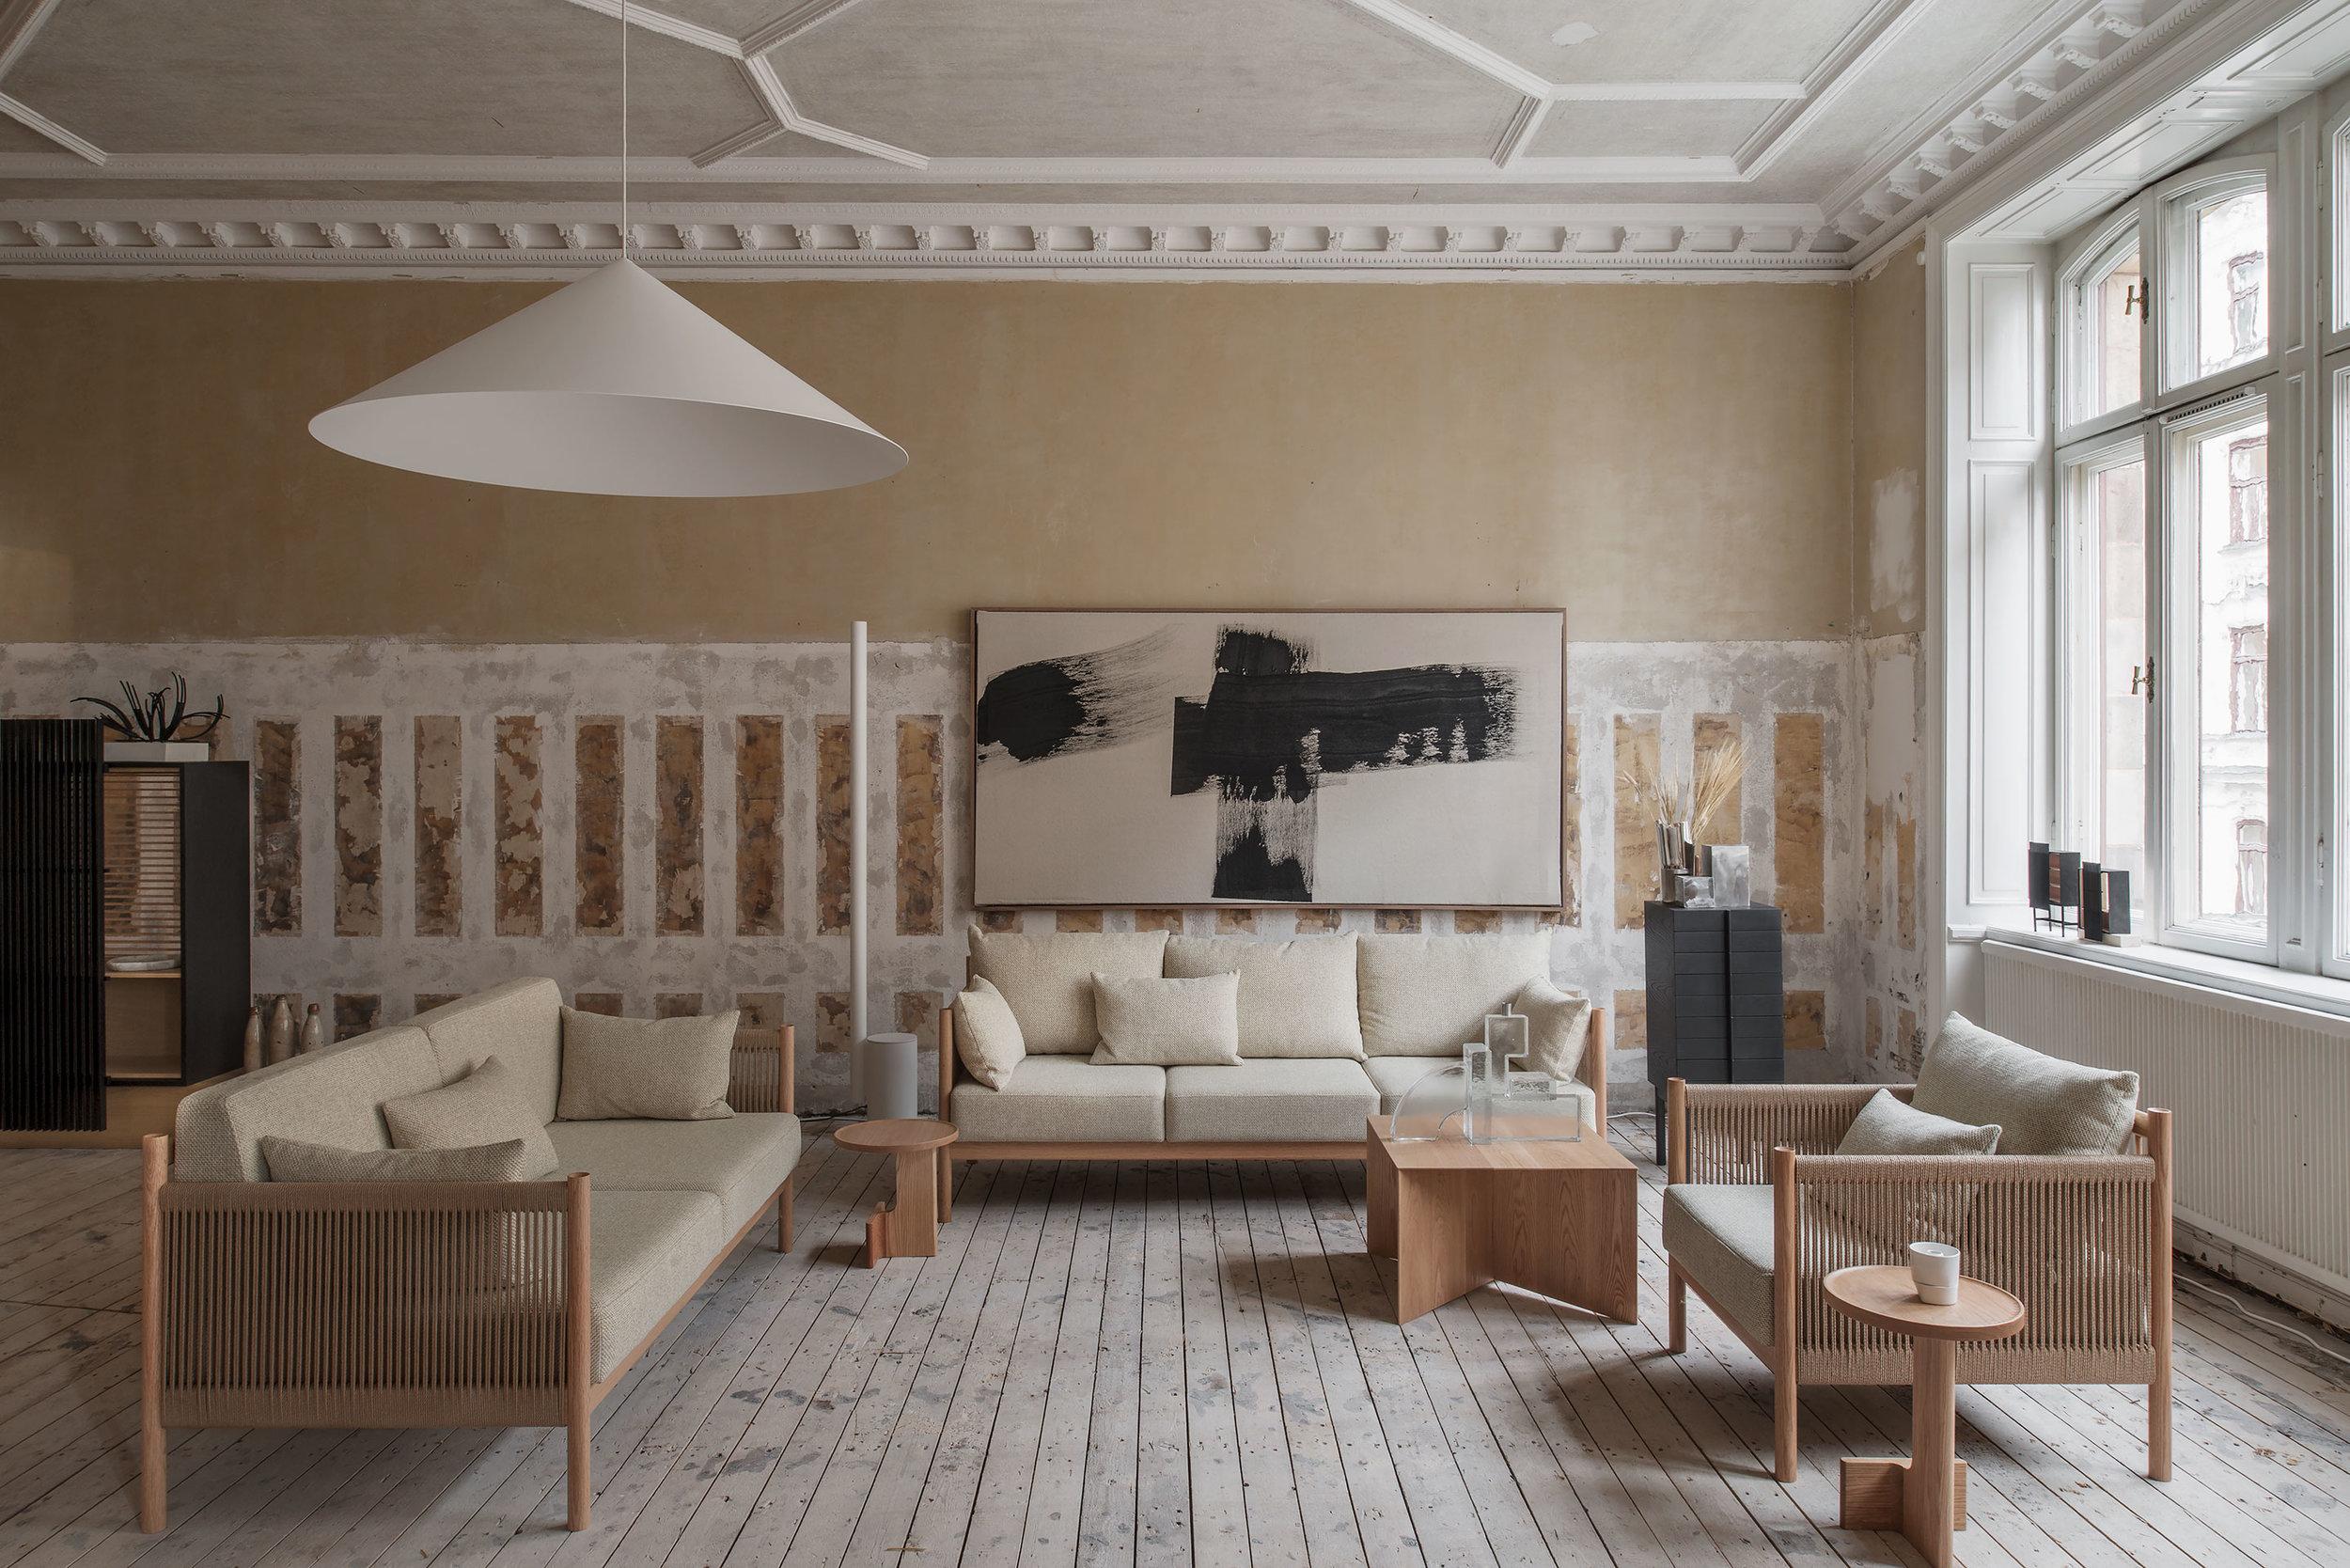 ariake furniture stockholm japan gestalt new york